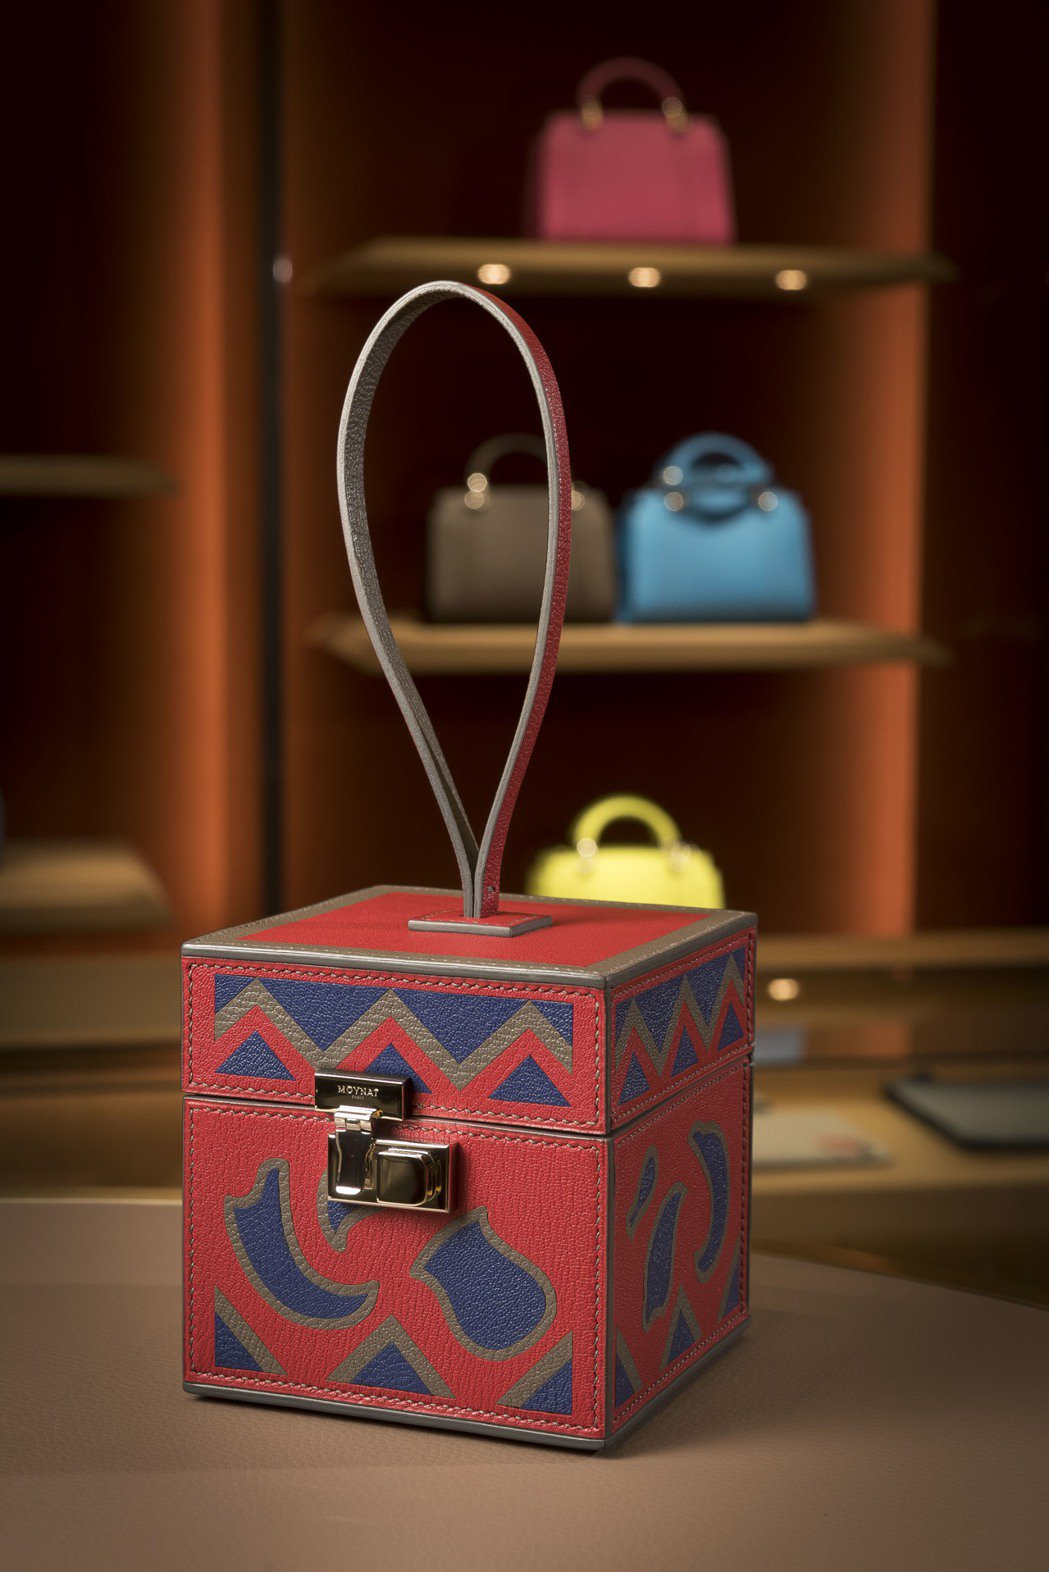 Mini Vanity紅色Art Deco裝飾藝術花紋拼皮手鐲包,售價18萬1,...